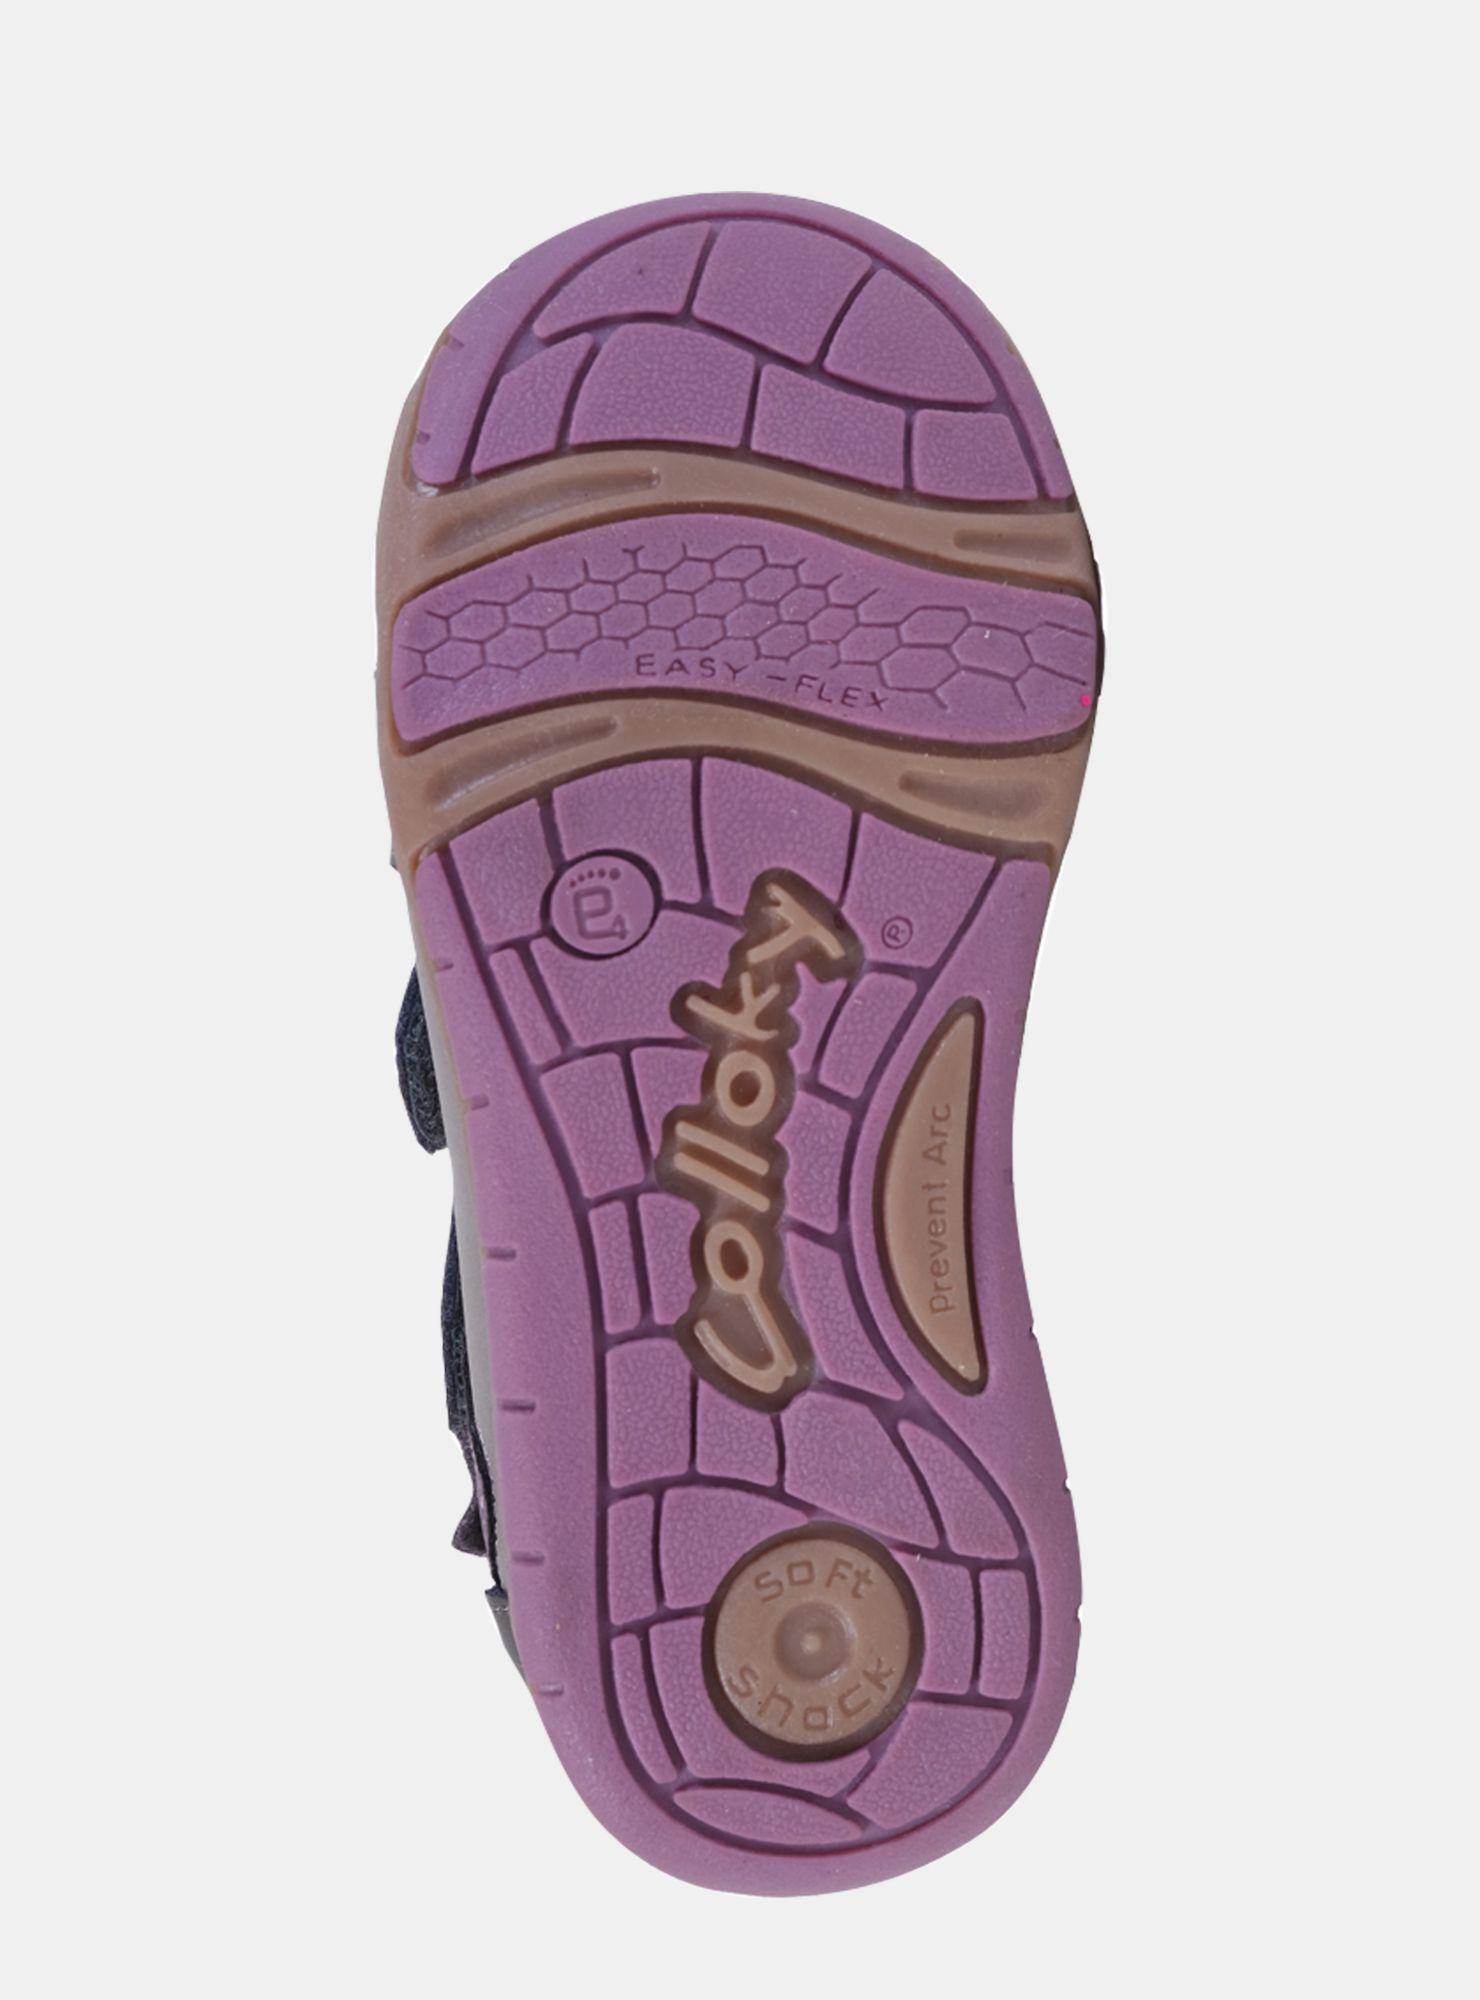 Botín Colloky Flor Gris Niña - Zapatos Bebé  d90fc13daf179